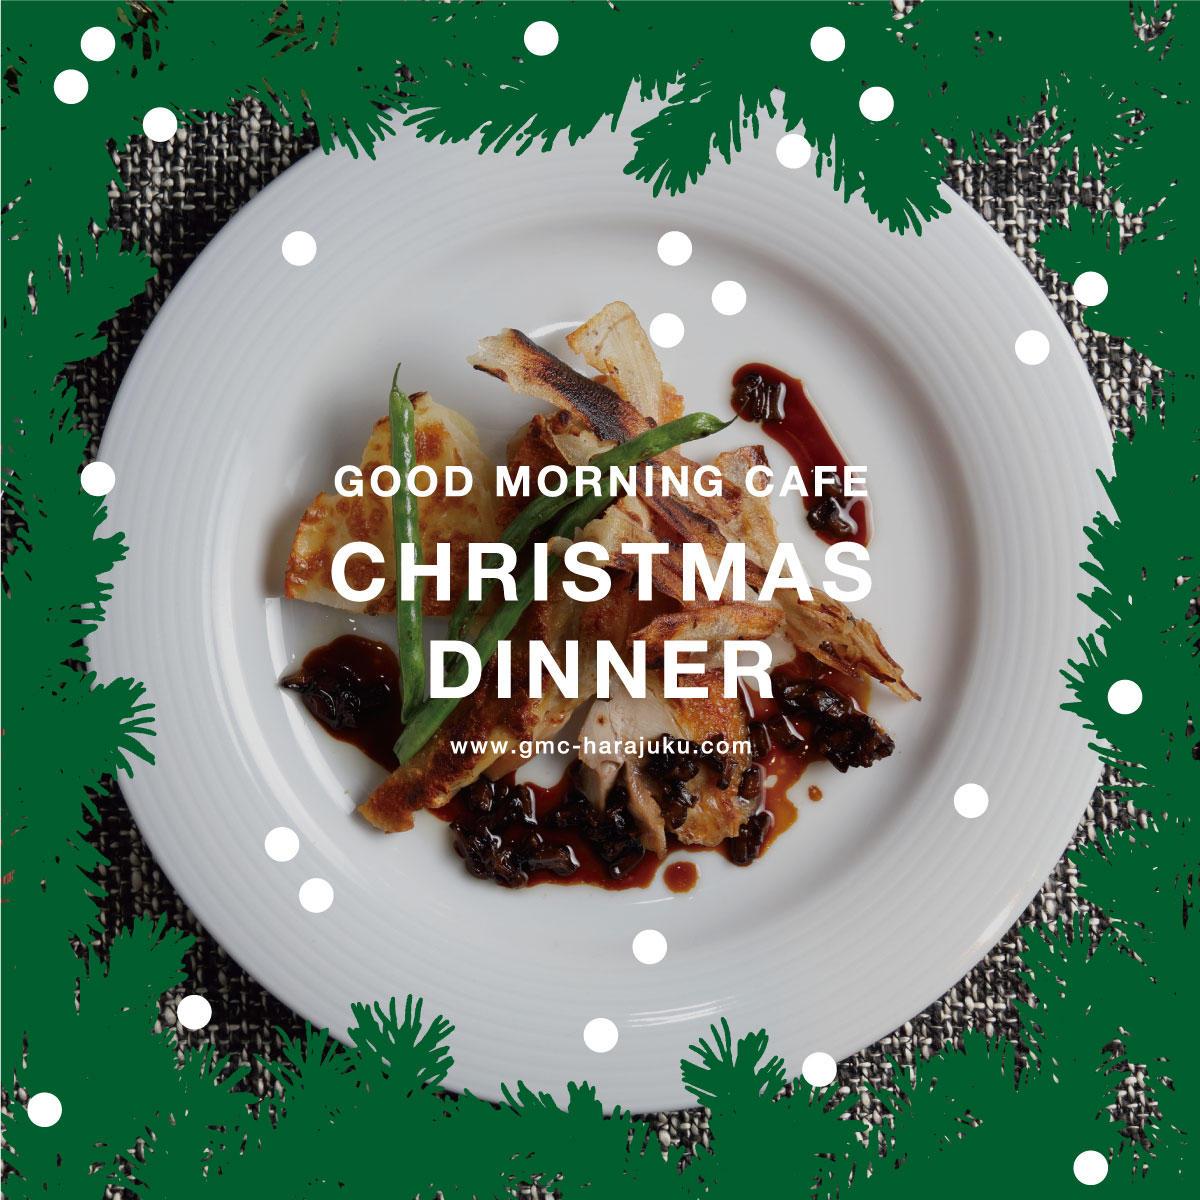 GOOD MORNING CAFE & GRILL キュウリのクリスマス